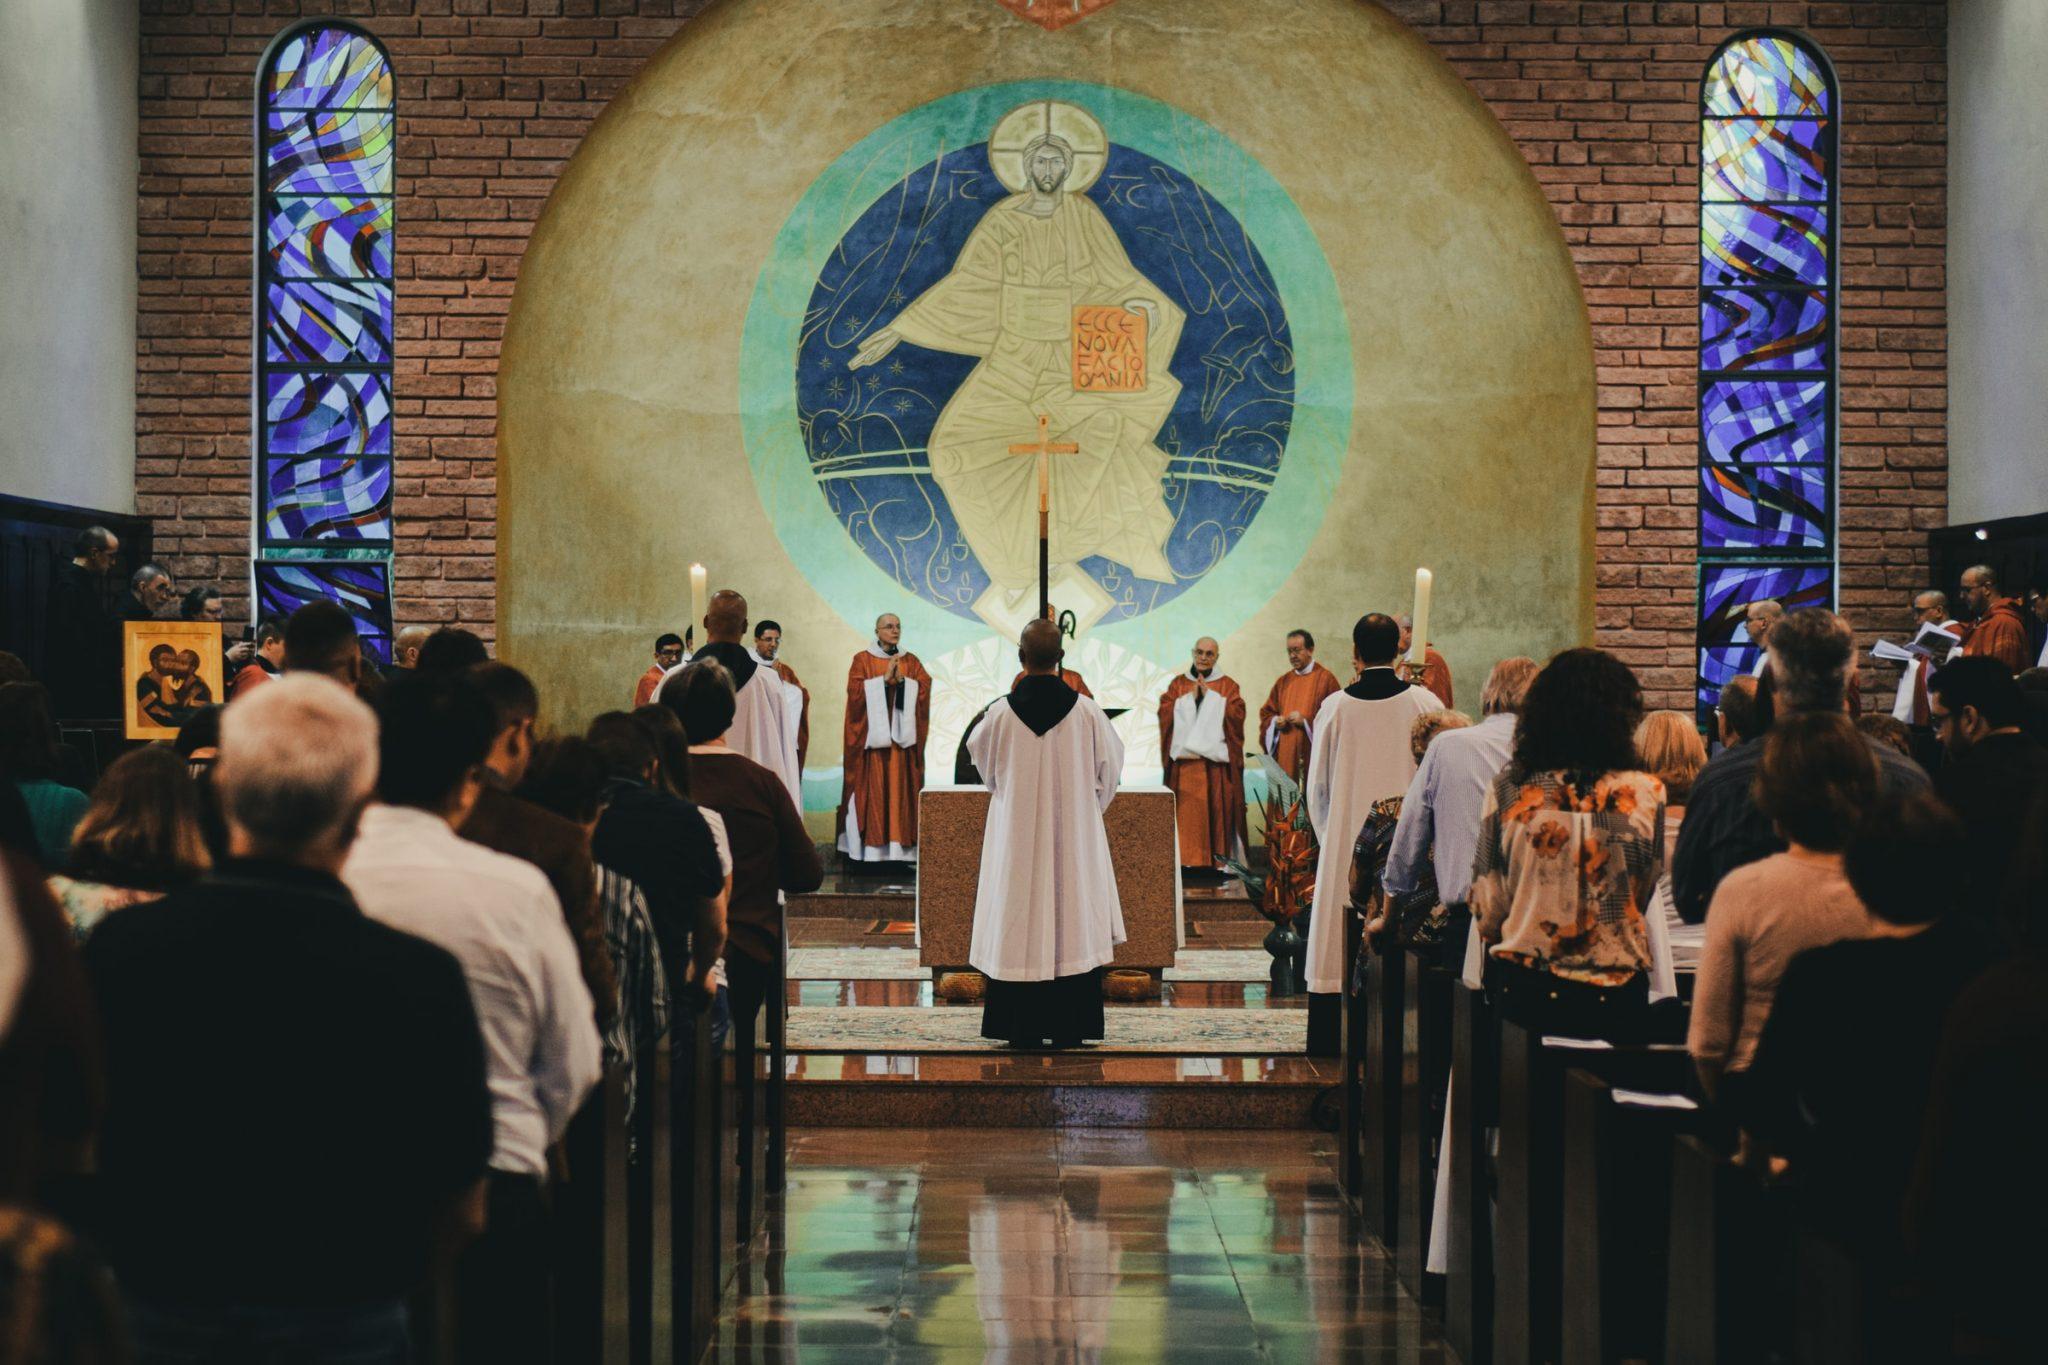 mateus-campos-felipe – processione in chiesa